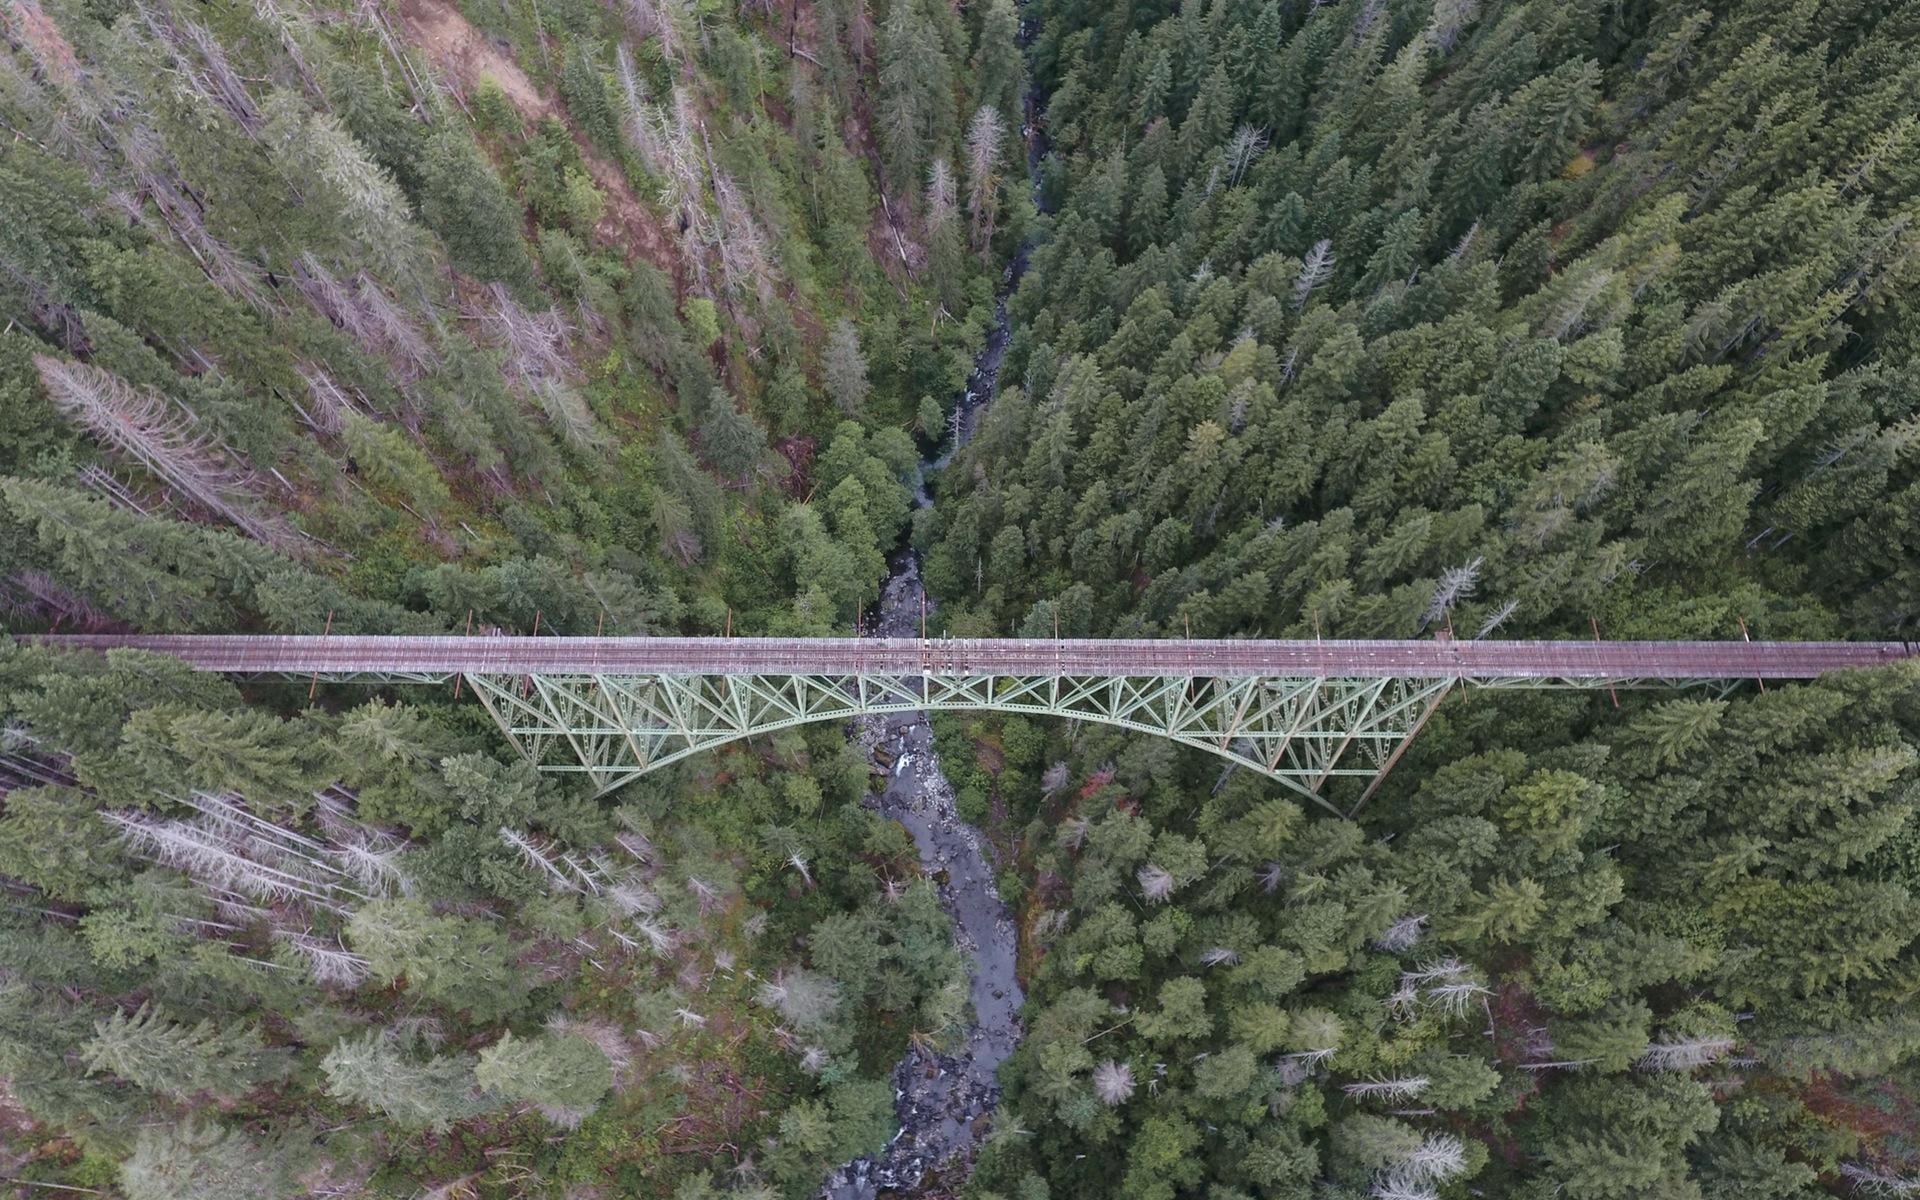 bridge aerial view wallpaper background